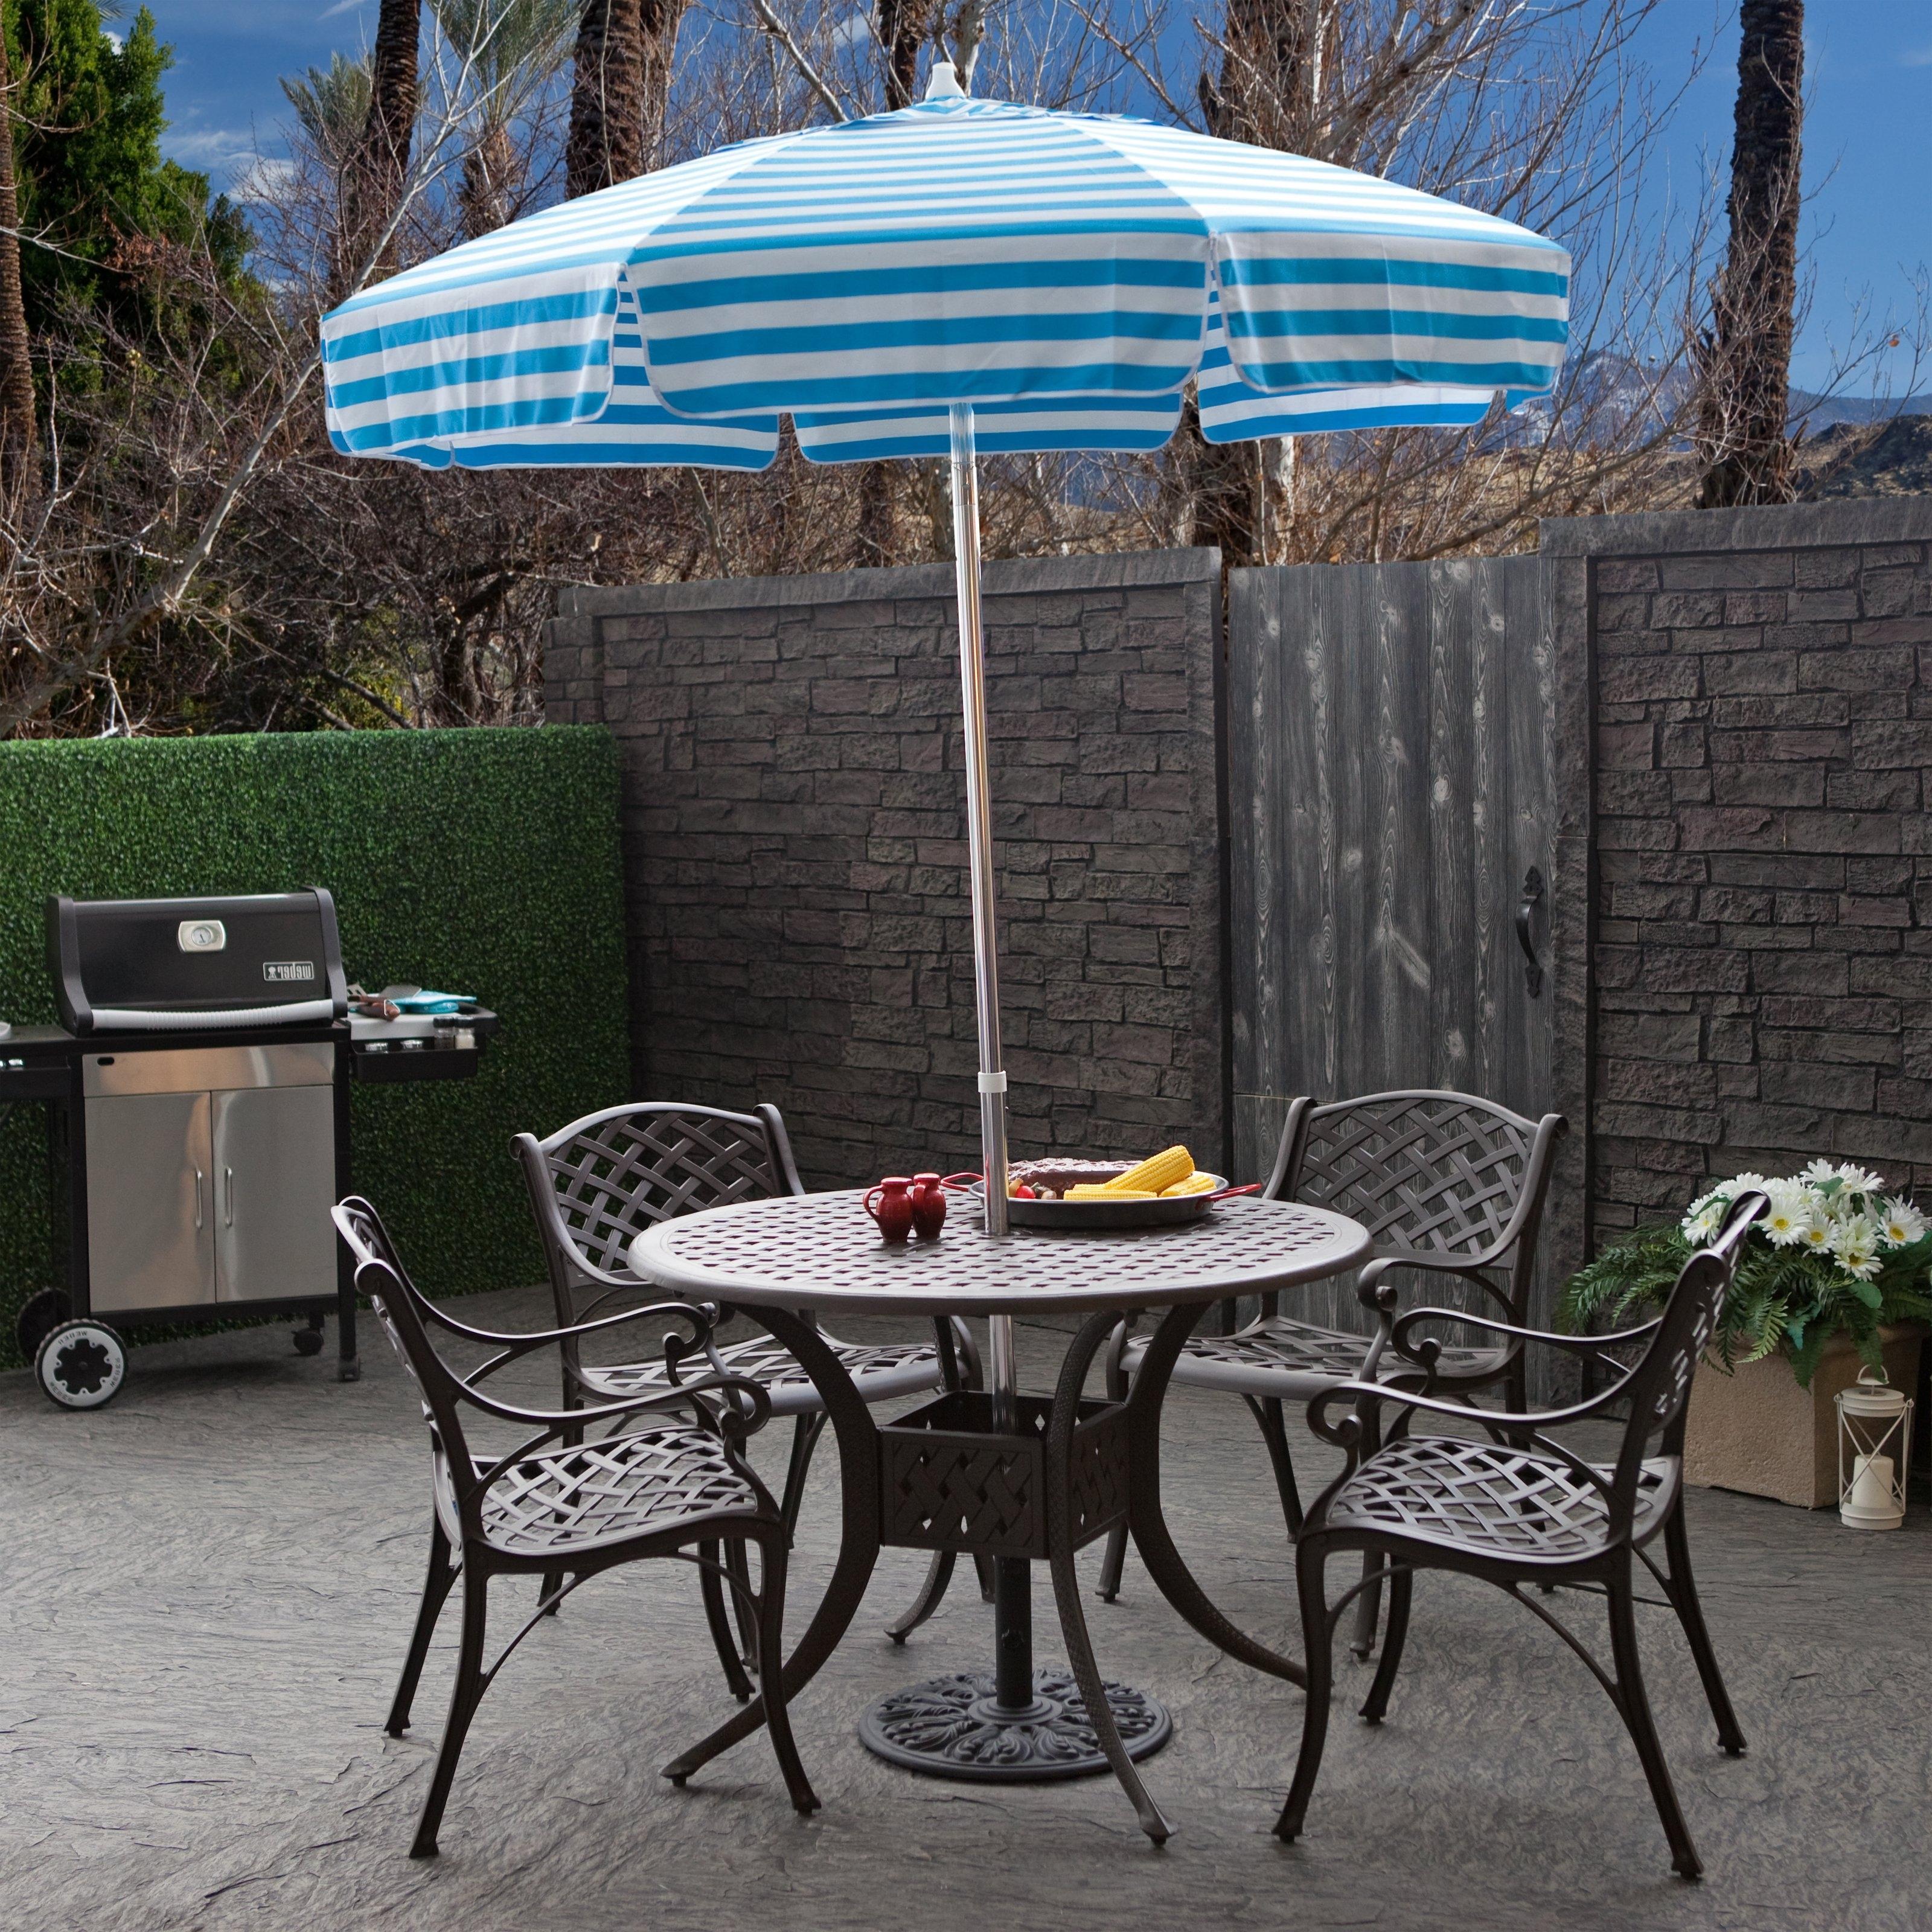 Trendy Incredible Patio Table Umbrellas Destinationgear 6 Ft Aluminum Inside Patio Umbrellas For Tables (View 13 of 20)